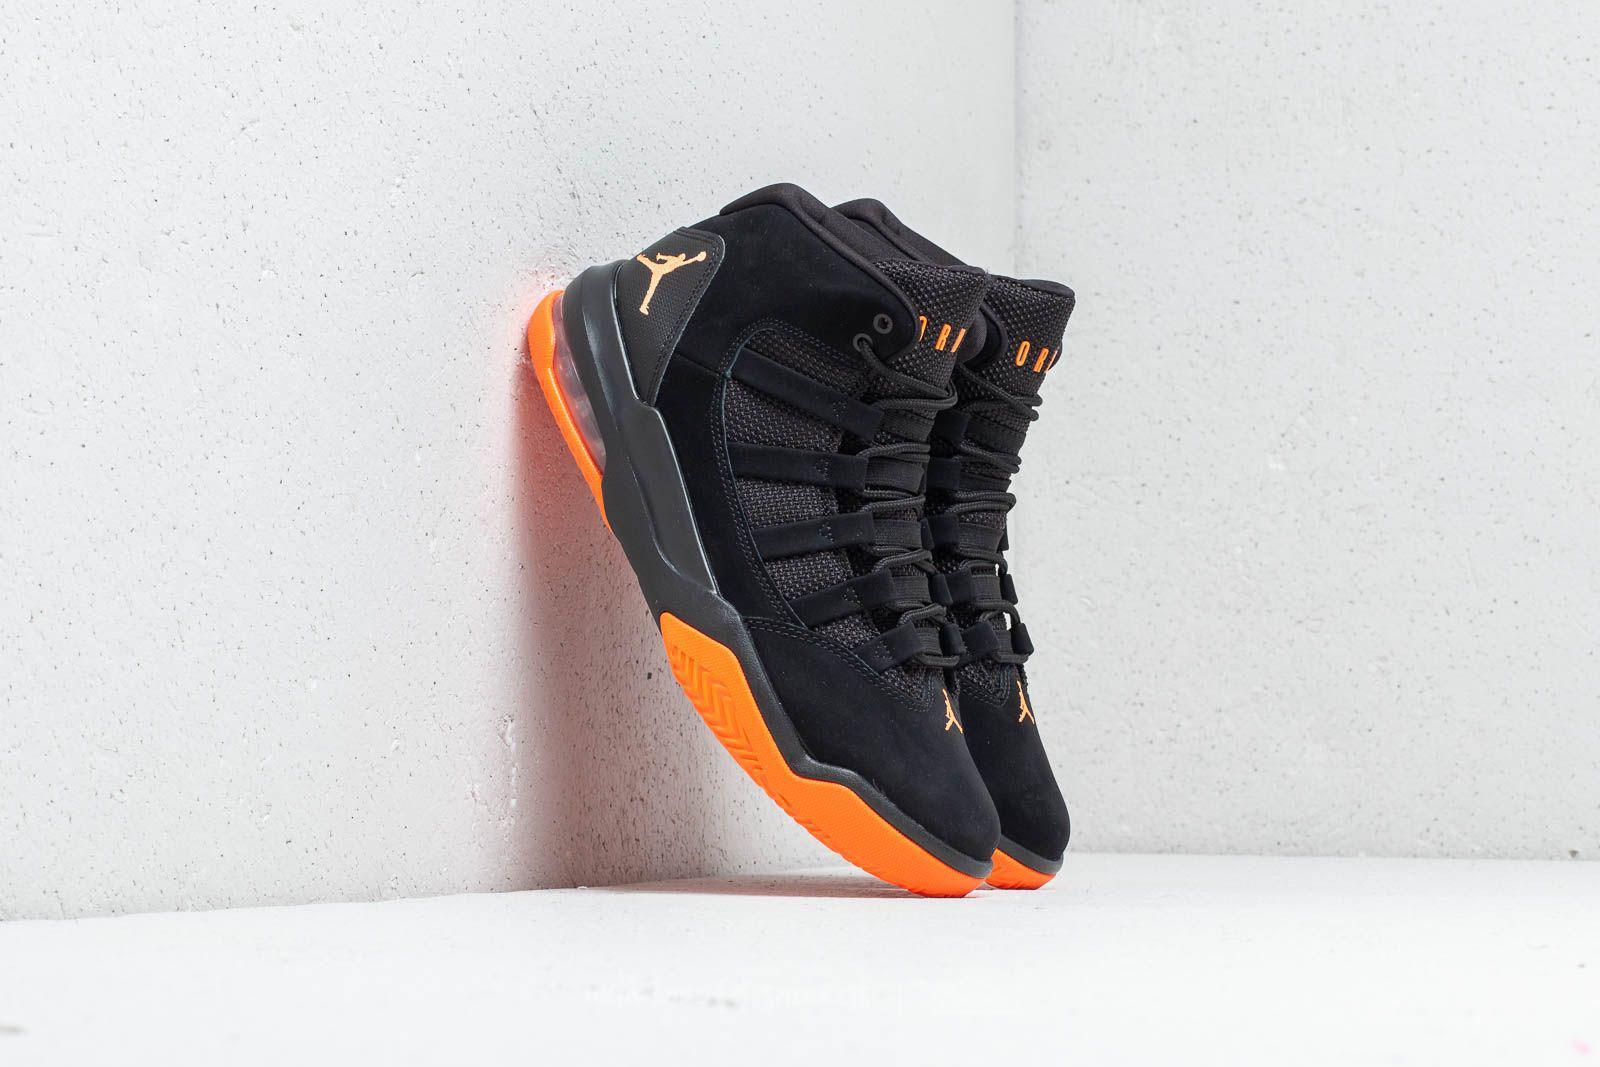 de642261bbc868 Nike Max Aura Black  Cone-black in Black for Men - Lyst